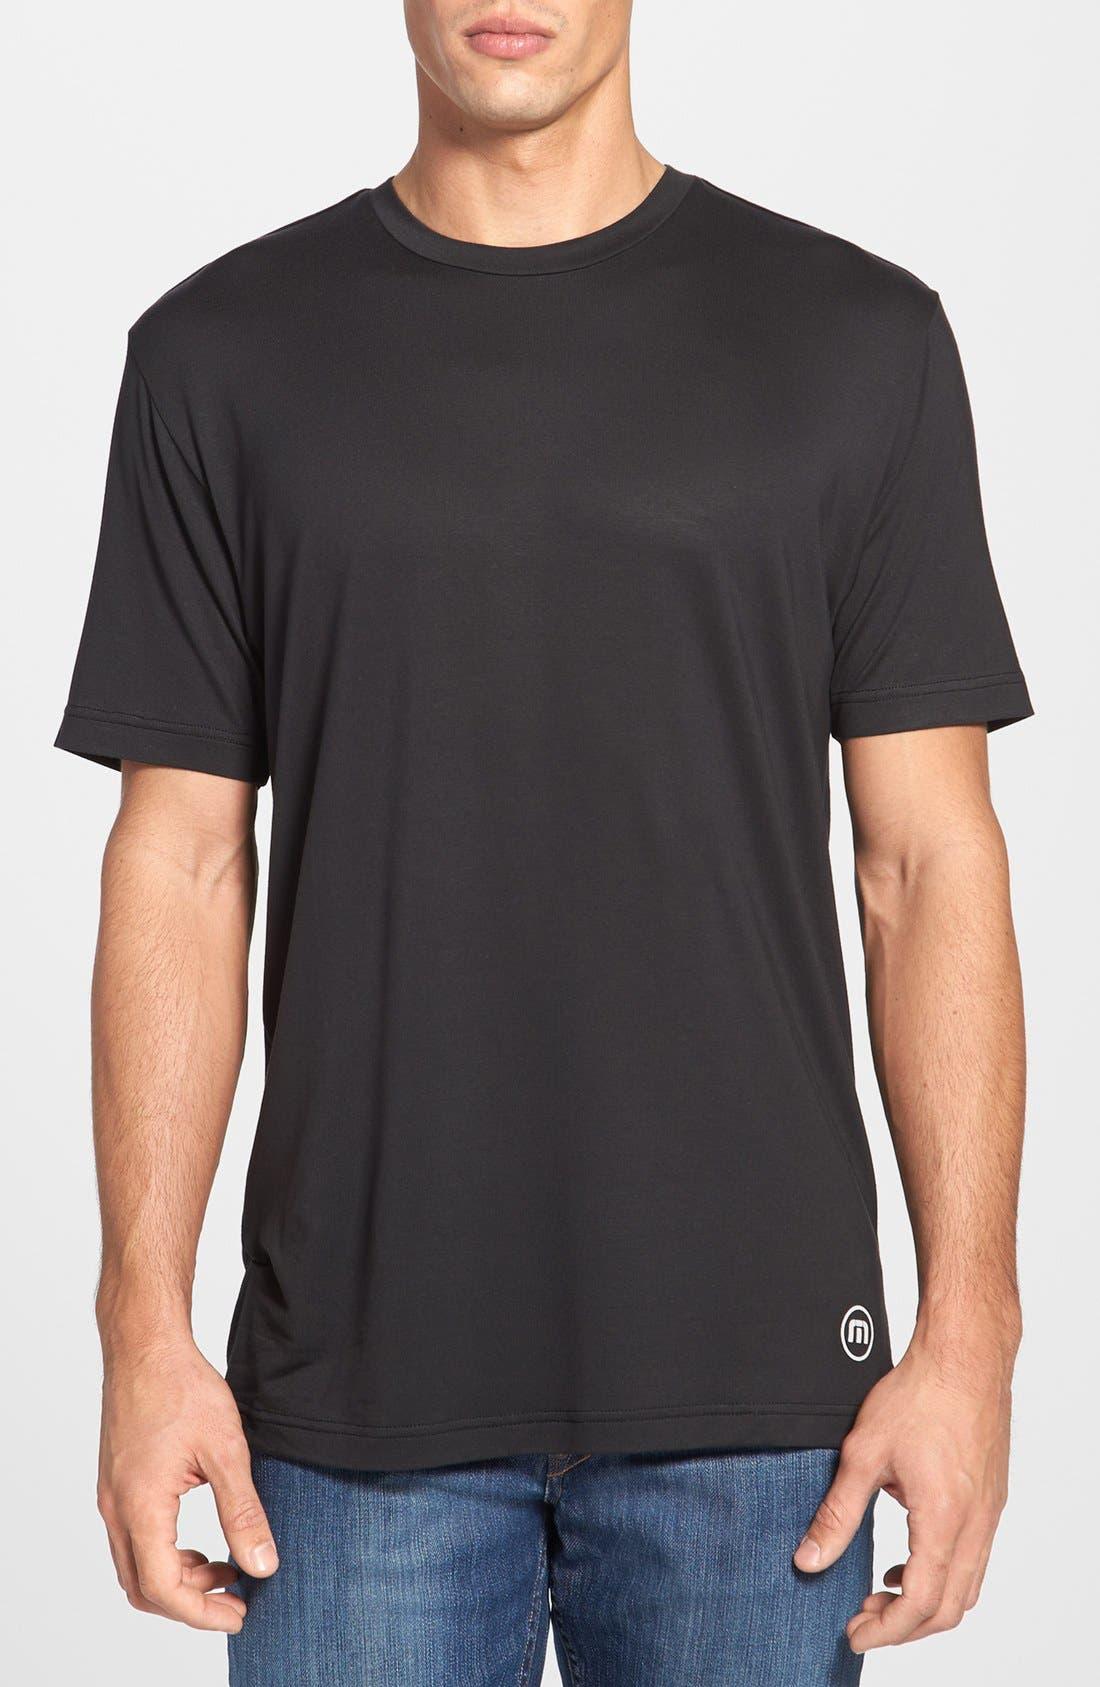 Main Image - Travis Mathew 'Upshall' Trim Fit T-Shirt